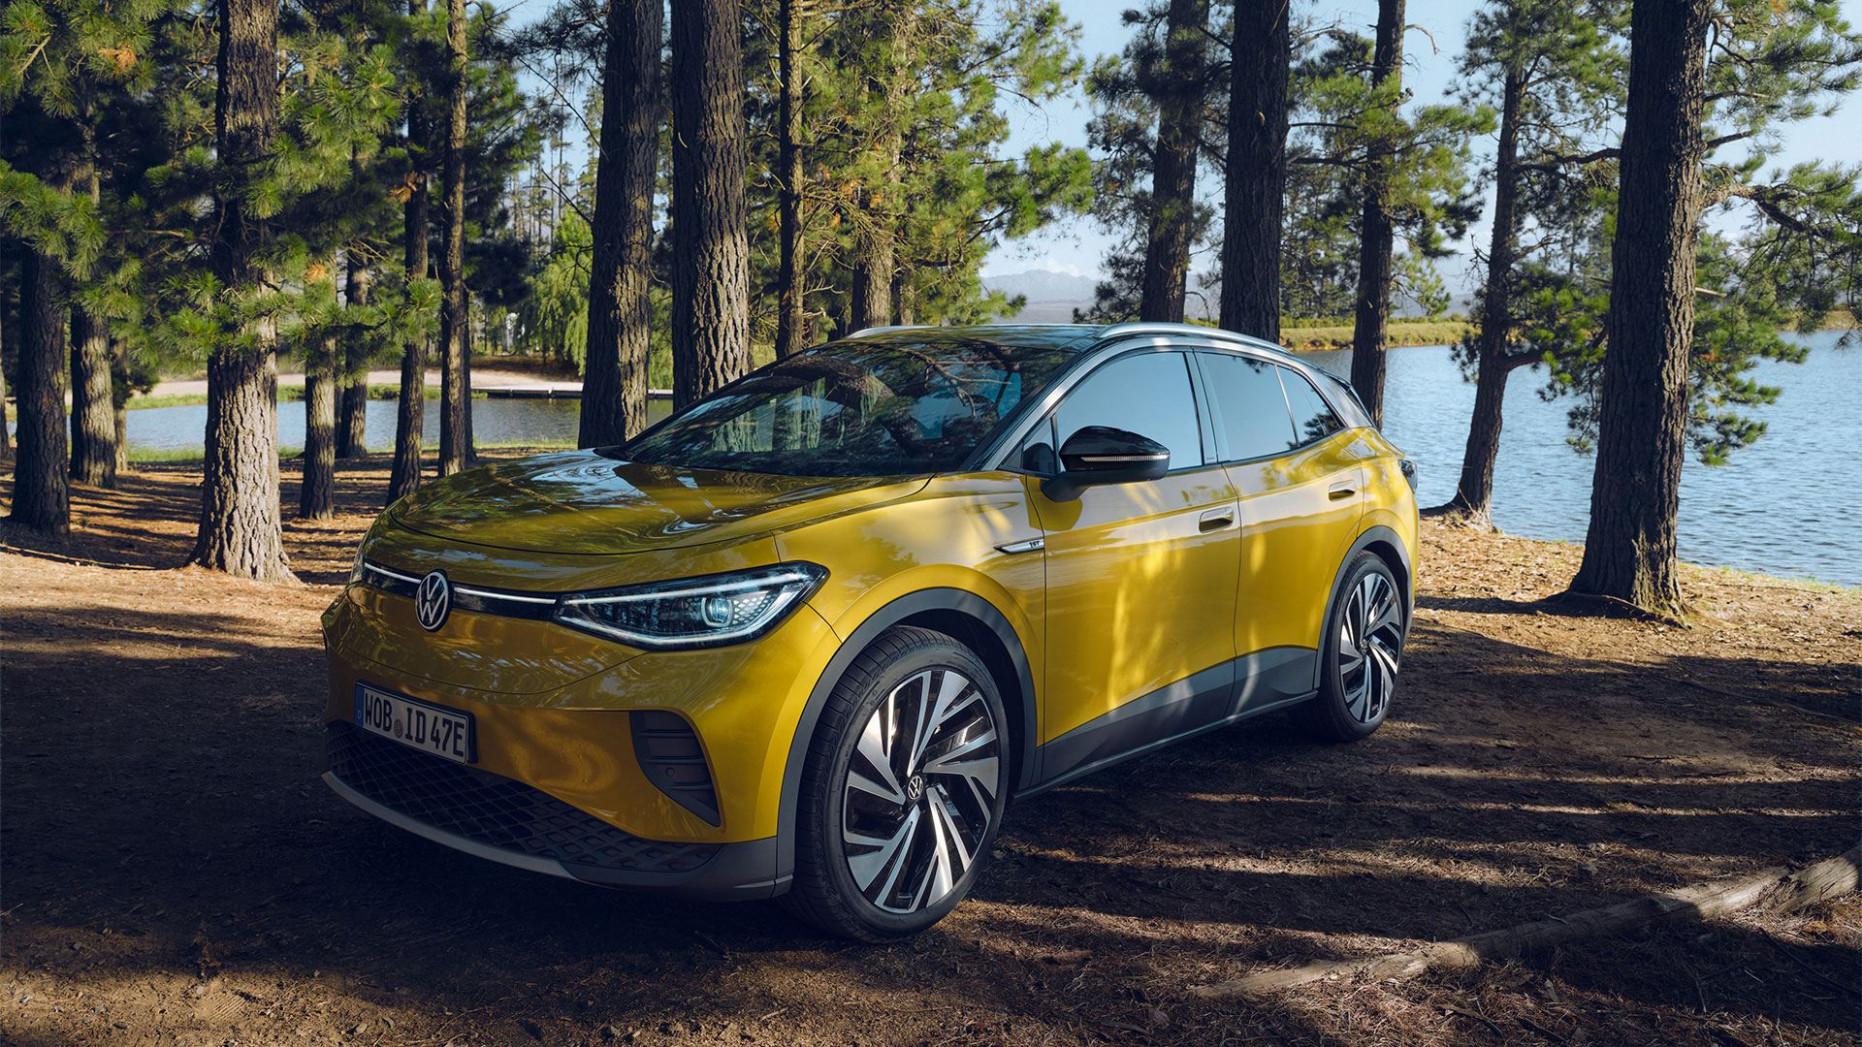 Rumors BMW Elbil 2022